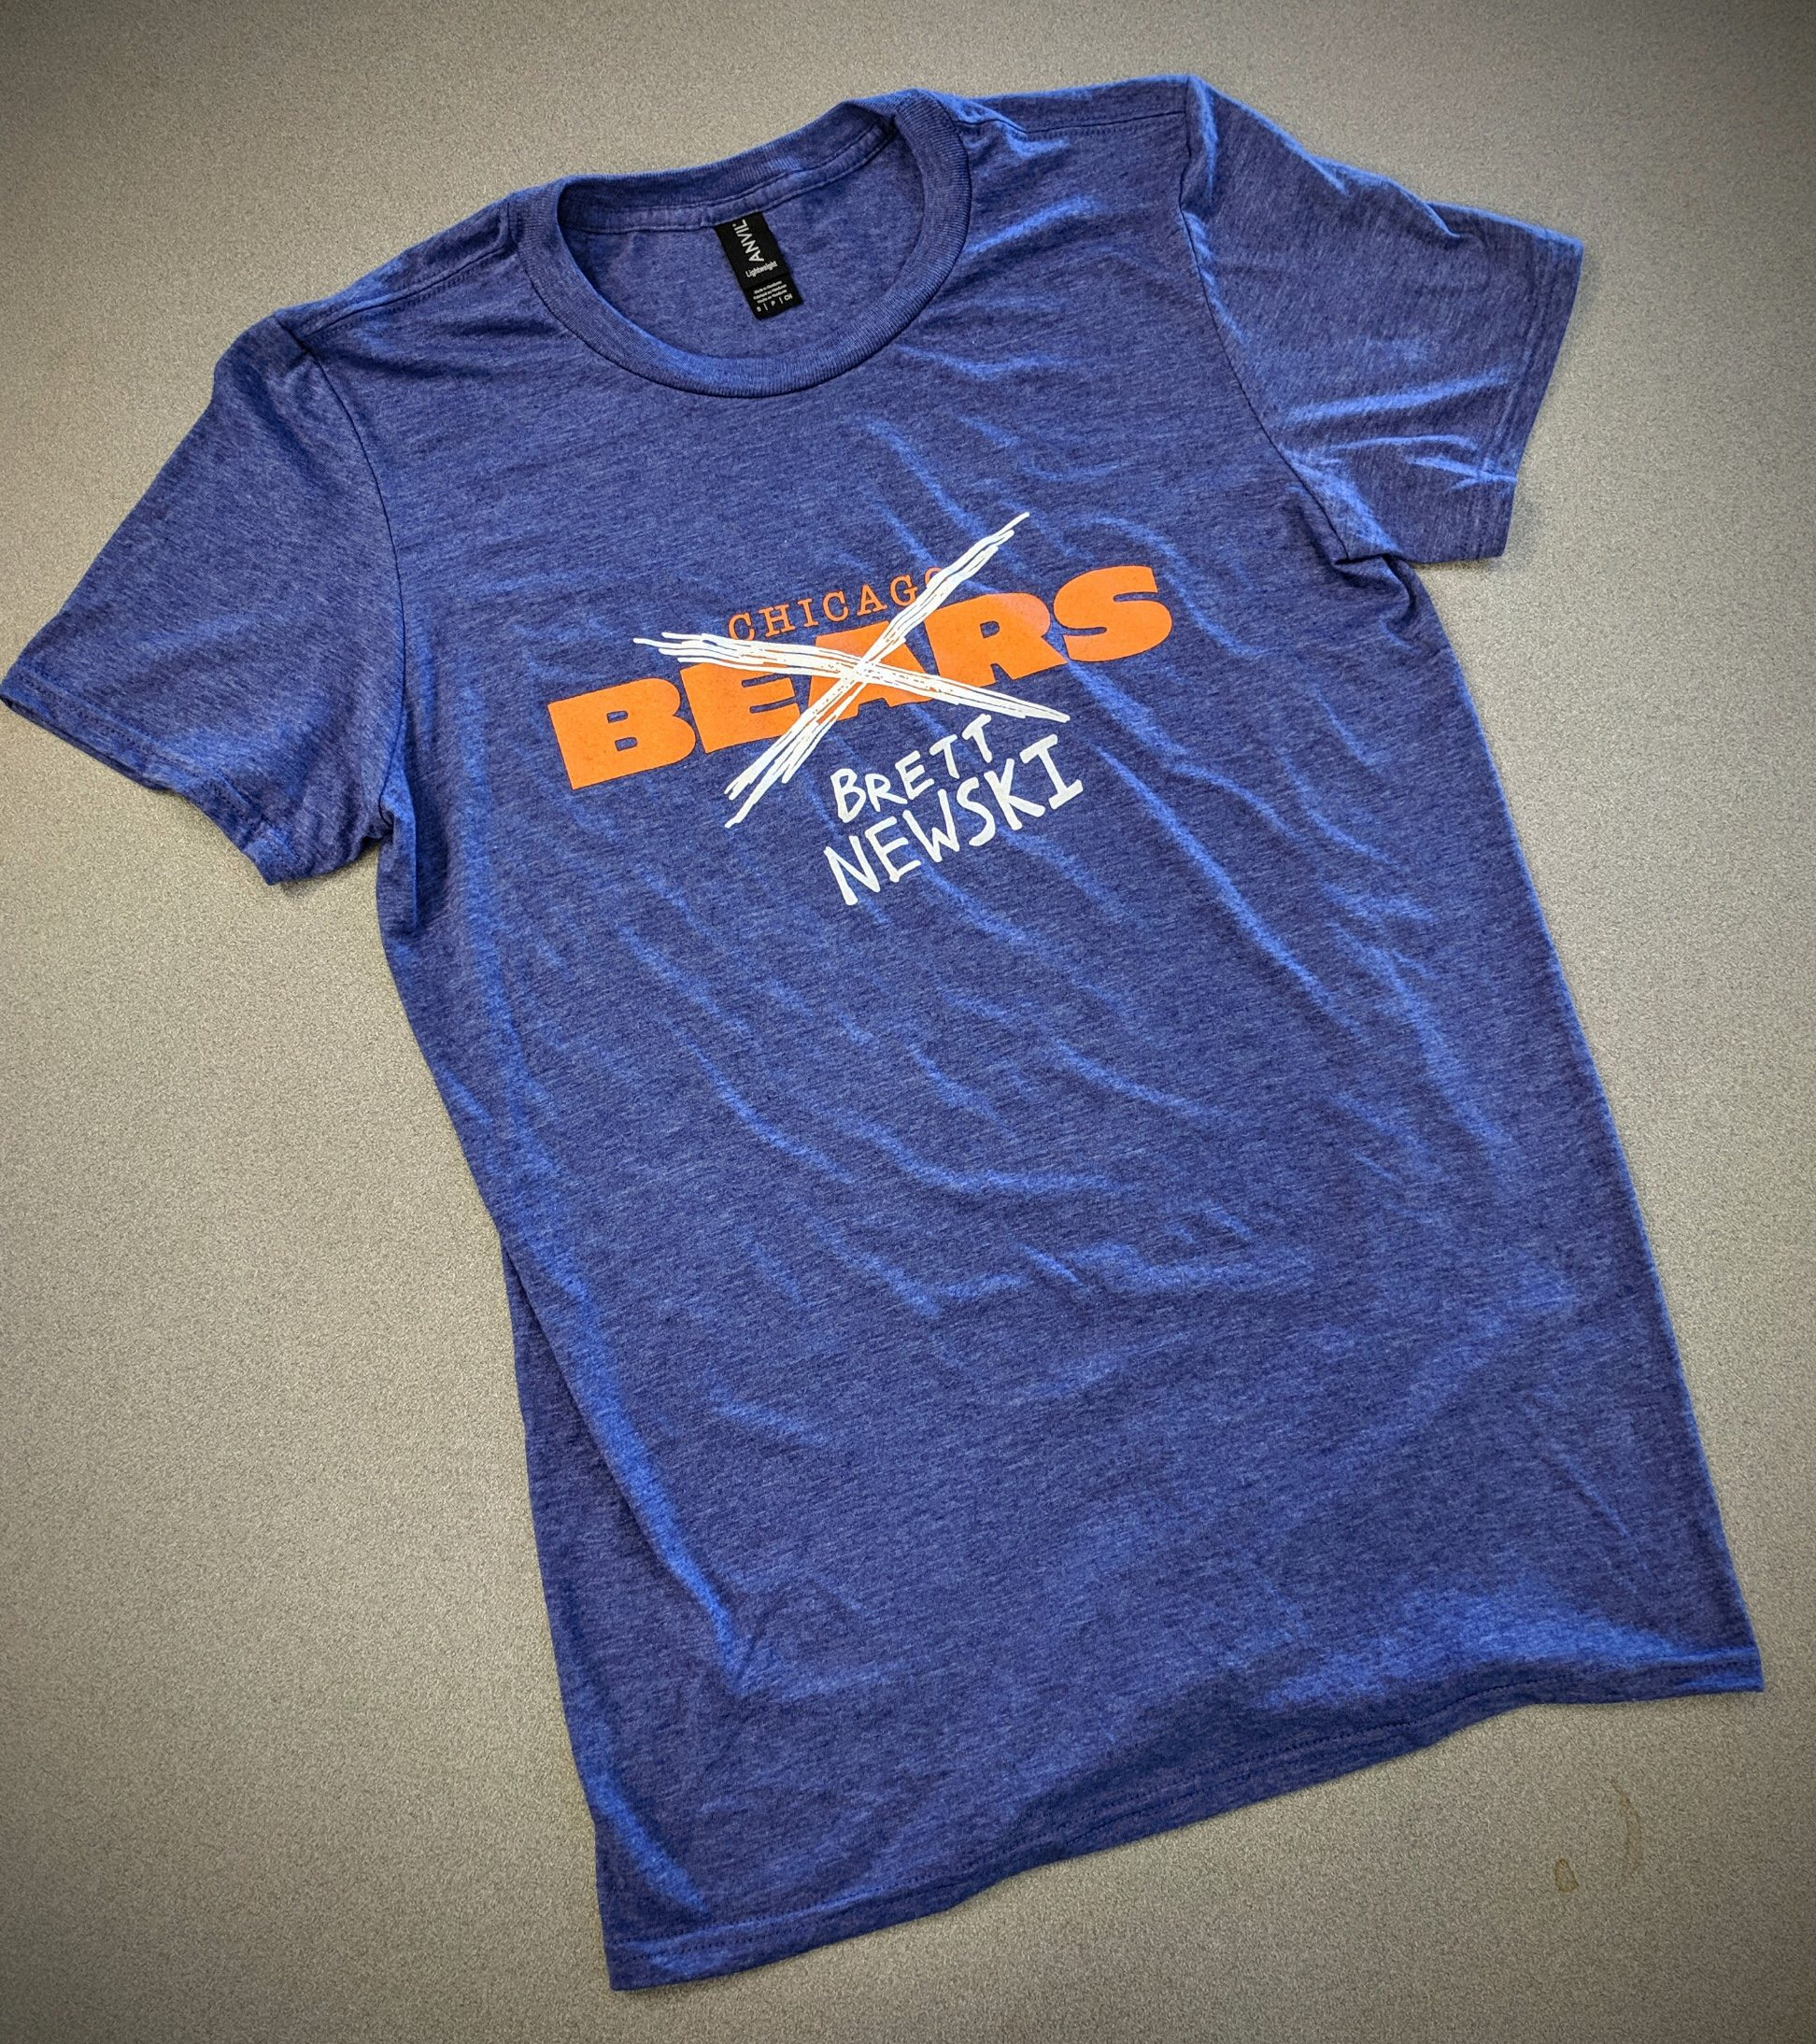 a6a5e4e2 Chicago Bears Brett Newski shirt — 90's kid.